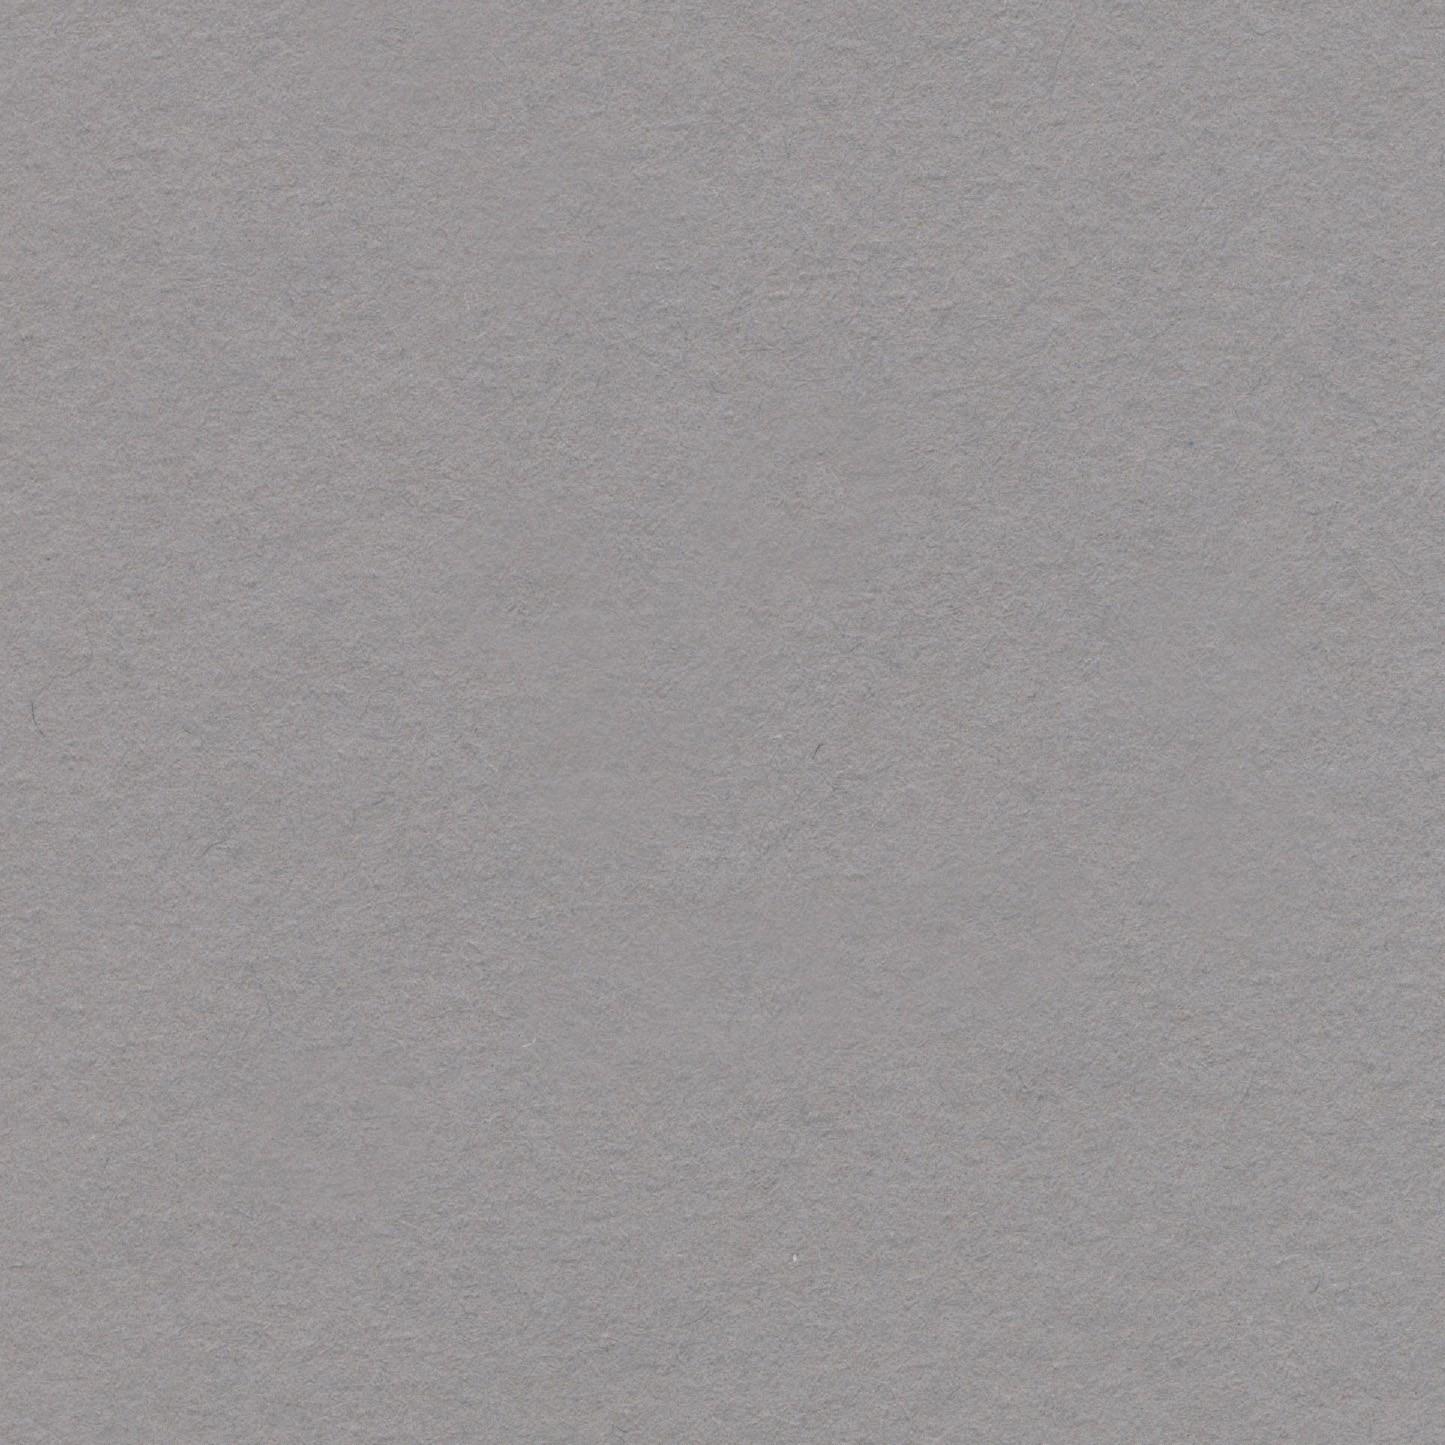 Grey - Grey 135gsm